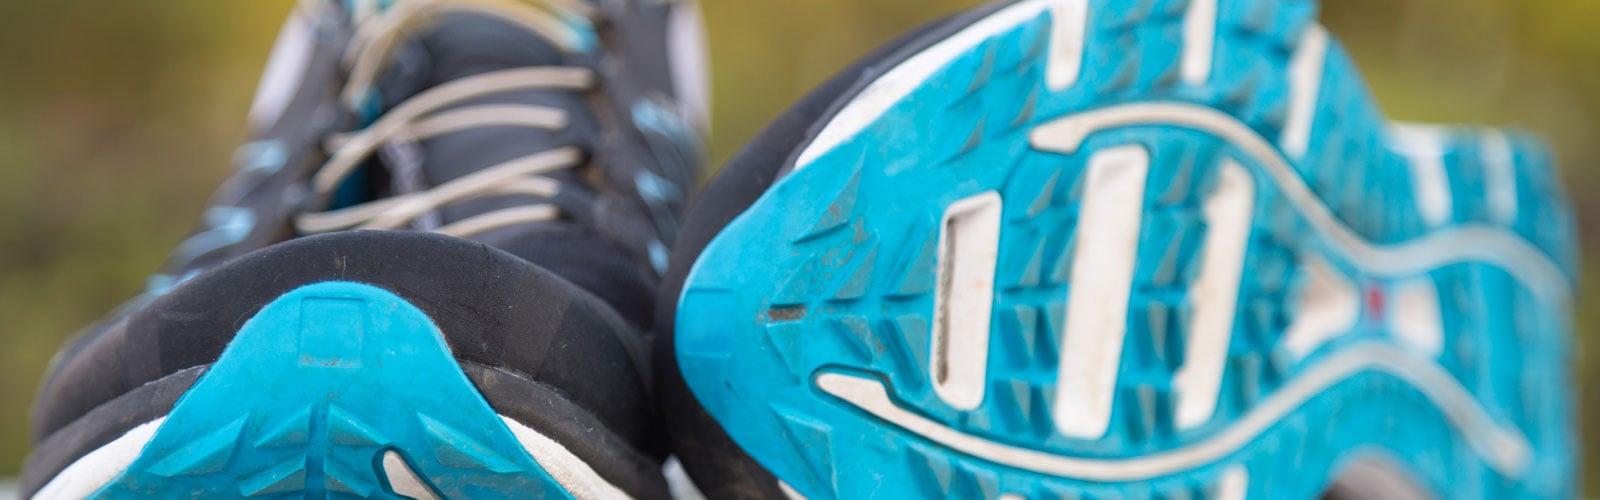 Running Shoe Tips